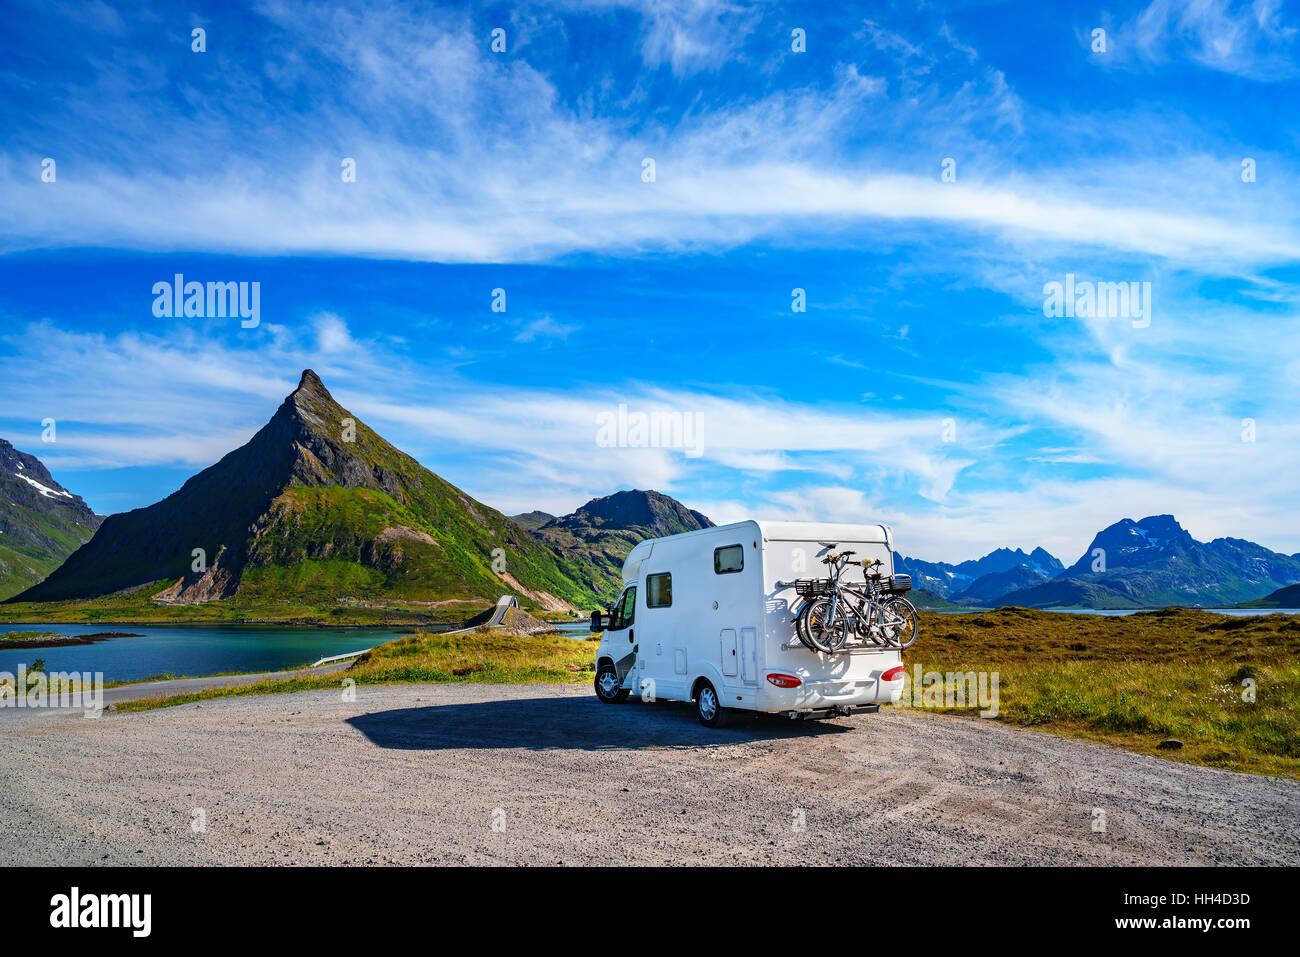 Family vacation travel, holiday trip in motorhome, Caravan car Vacation. Beautiful Nature Norway natural landscape. - Stock Image